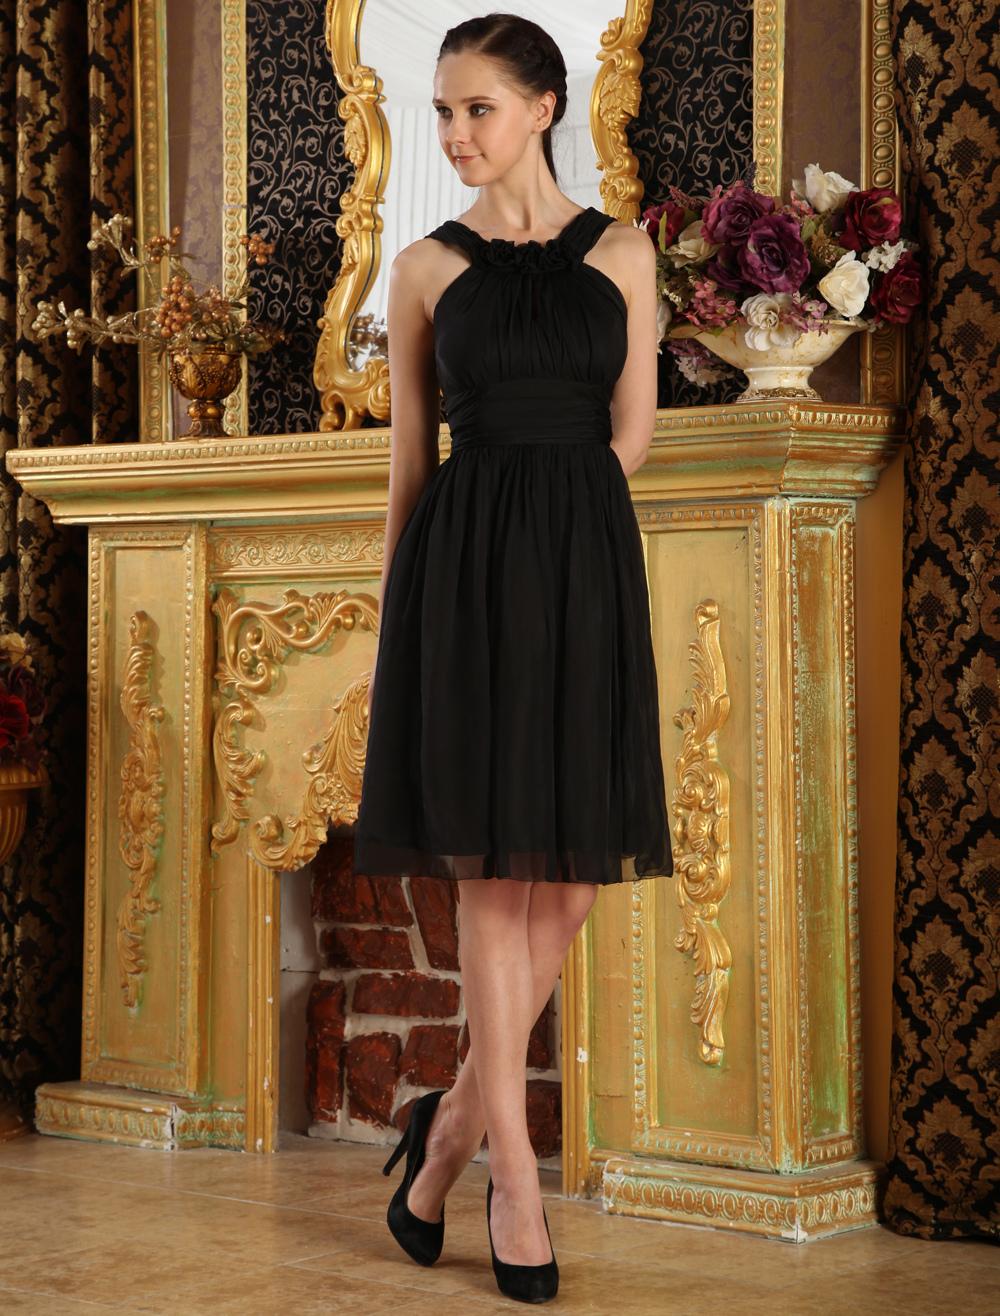 Black A-line Knee Length Chiffon Cocktail Dress (Wedding Cheap Party Dress) photo